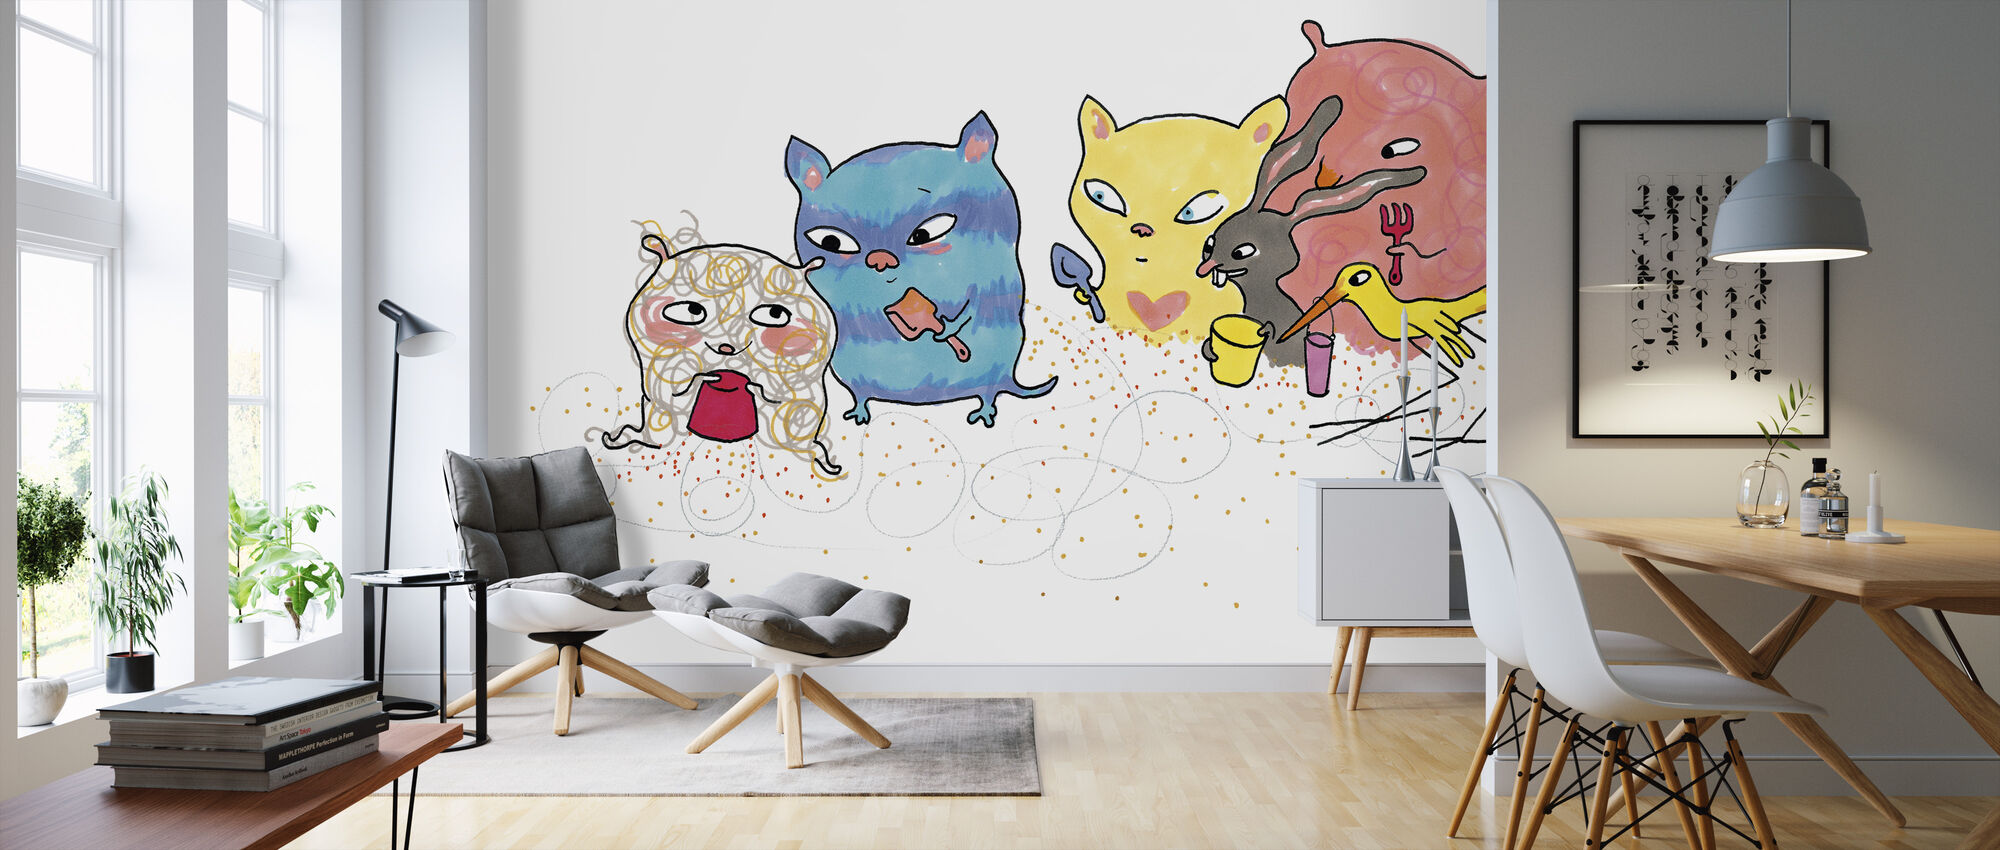 Whose sand castle - Wallpaper - Living Room